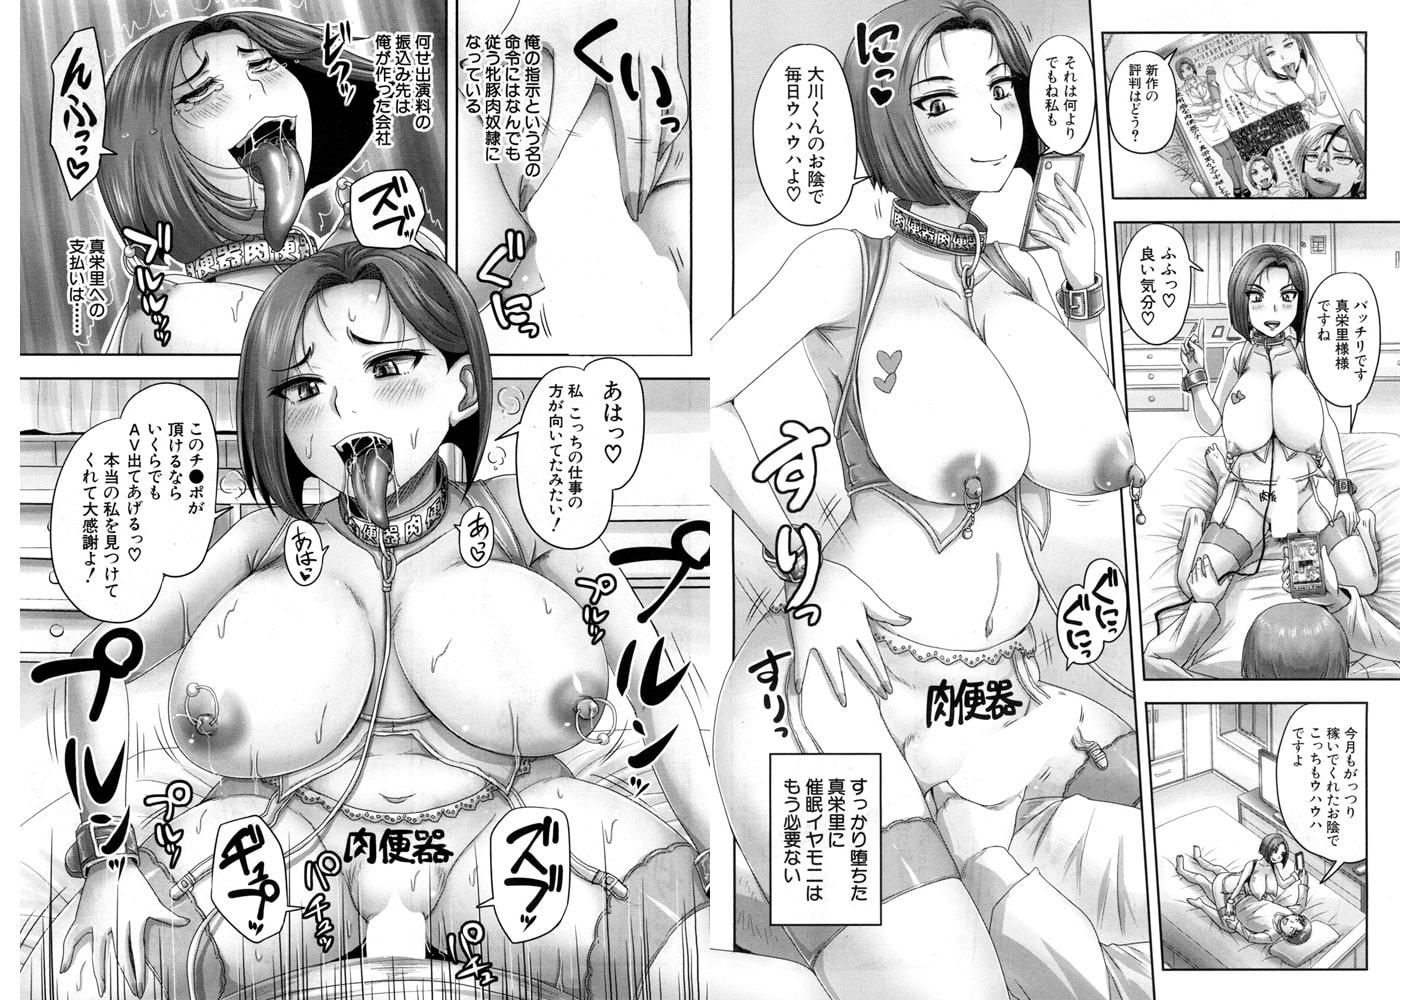 COMIC 夢幻転生 2019年1月号のサンプル8